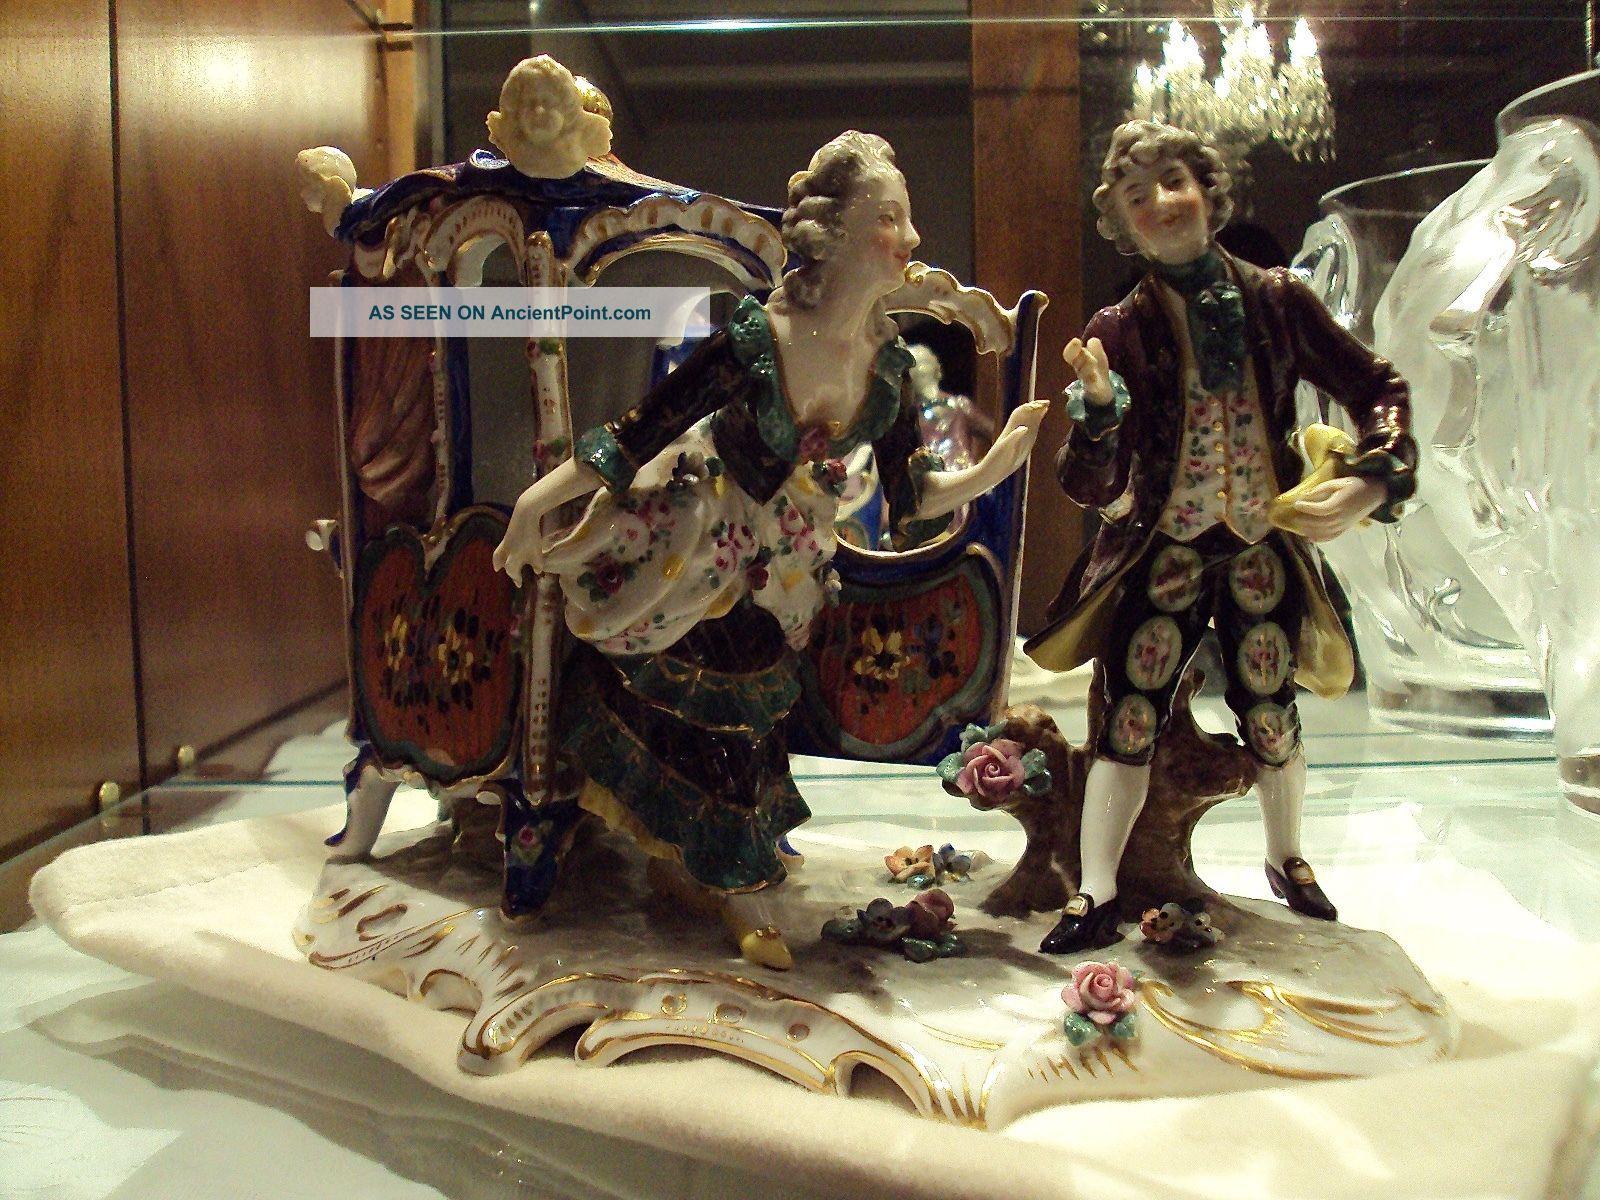 Royal Vienna Ladies Arrival Porcelain Figurine/austria Lat19th - E20thc/sanja Resv Figurines photo